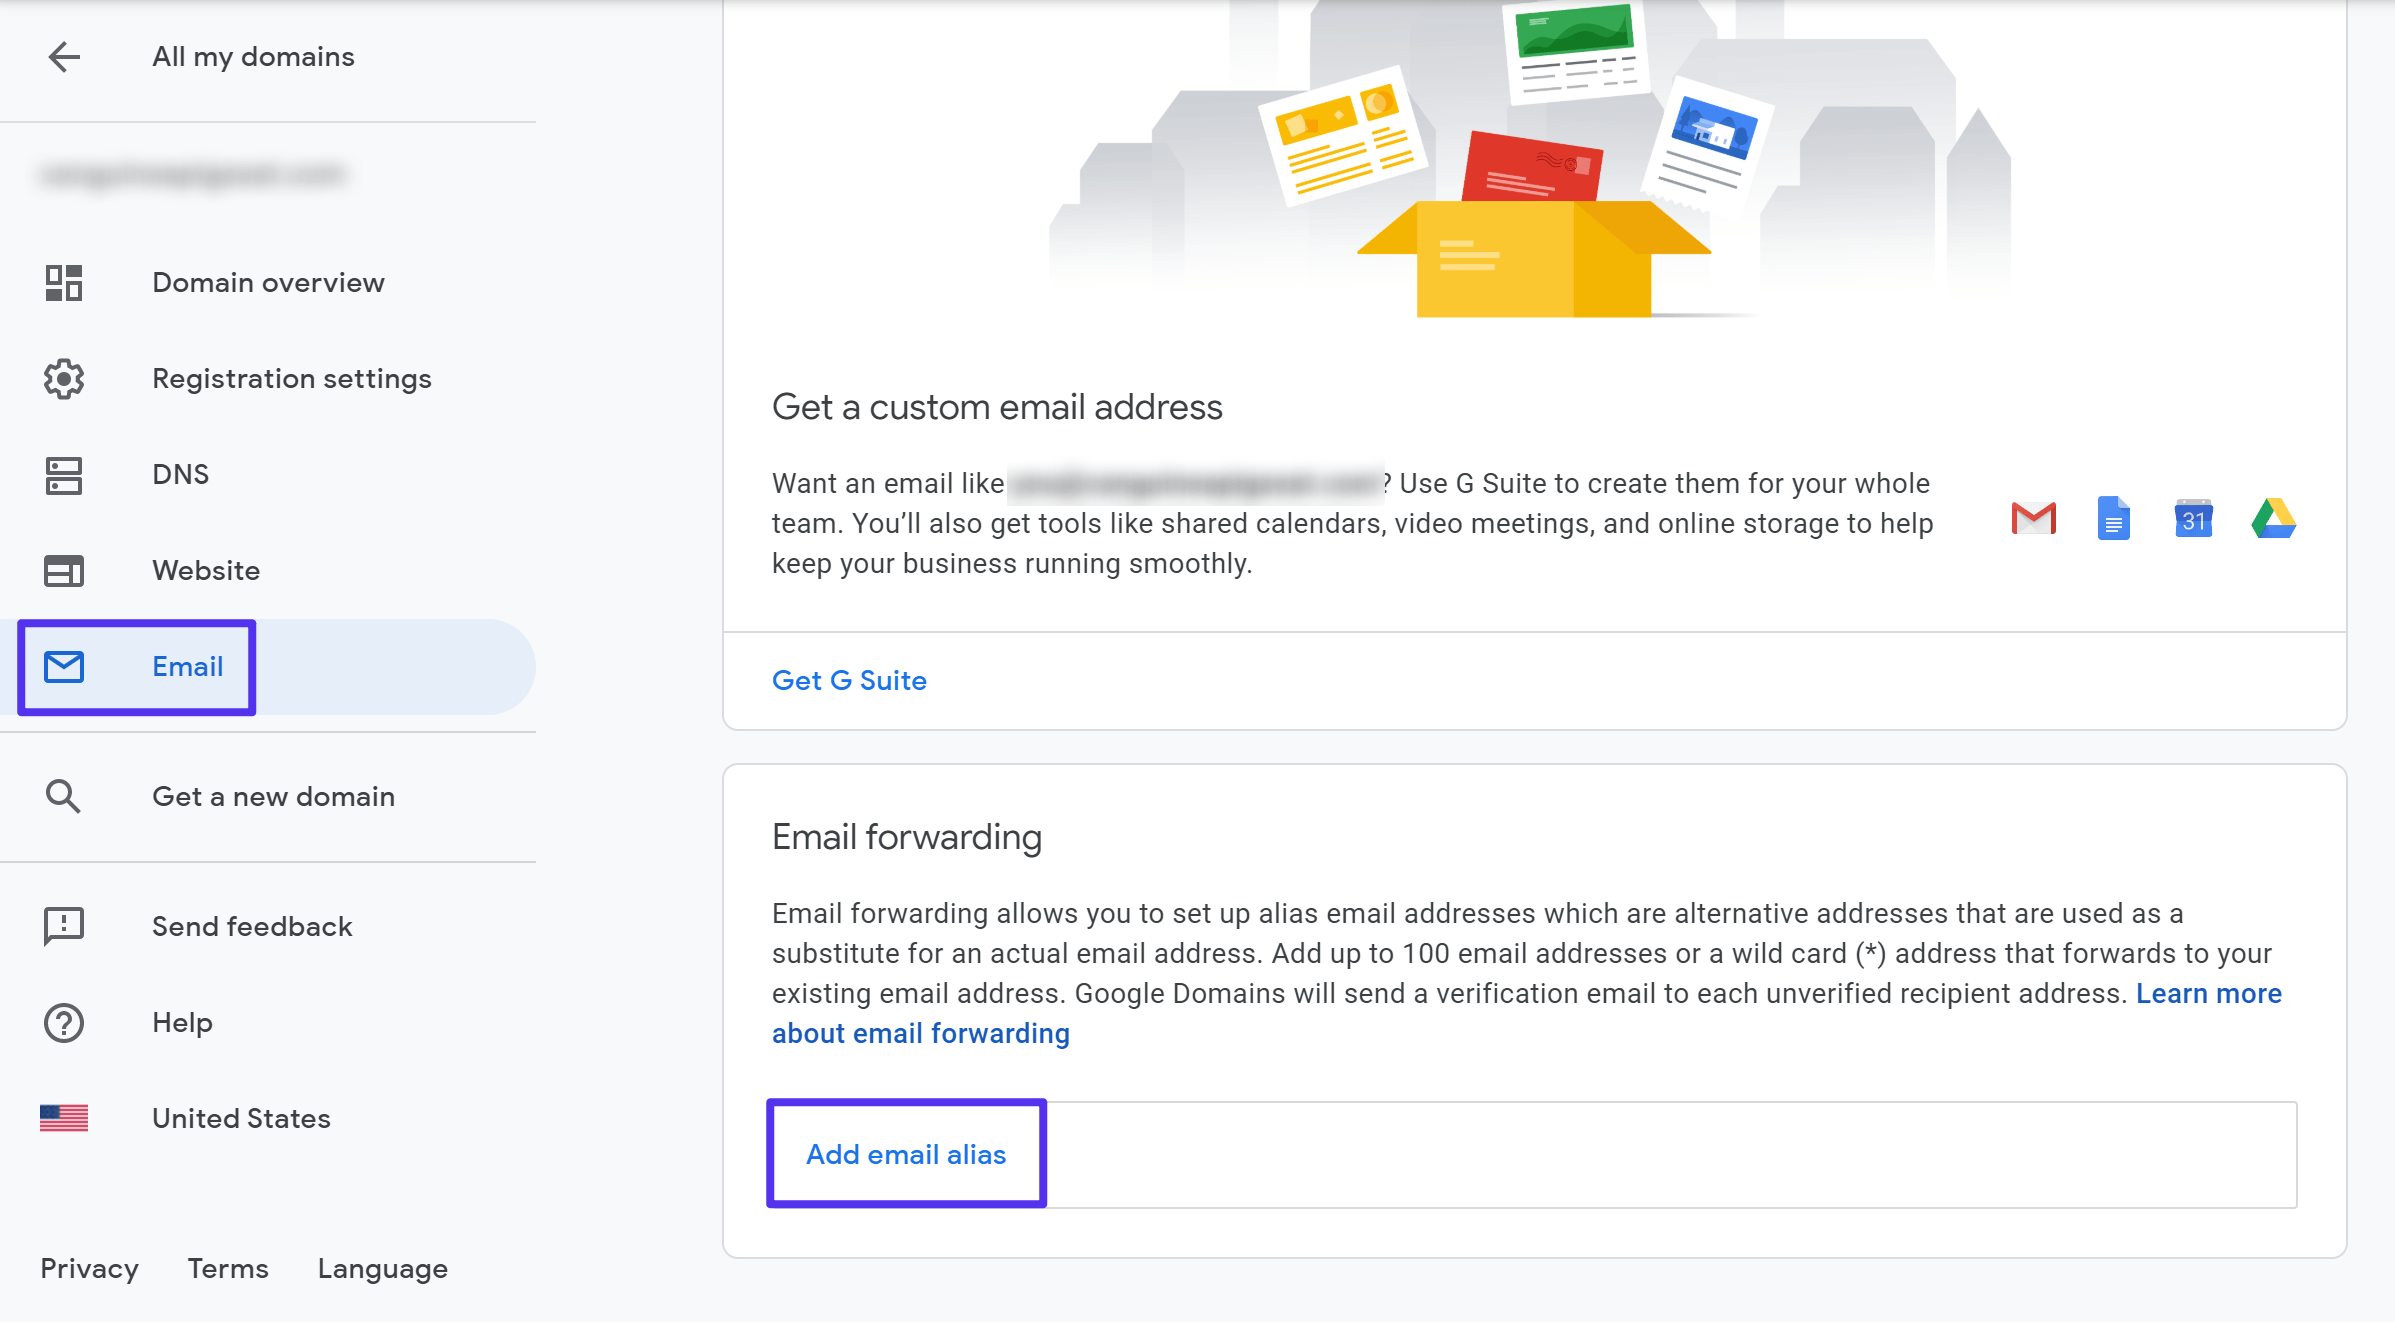 Hoe je e-mail aliassen aanmaakt op Google Domains